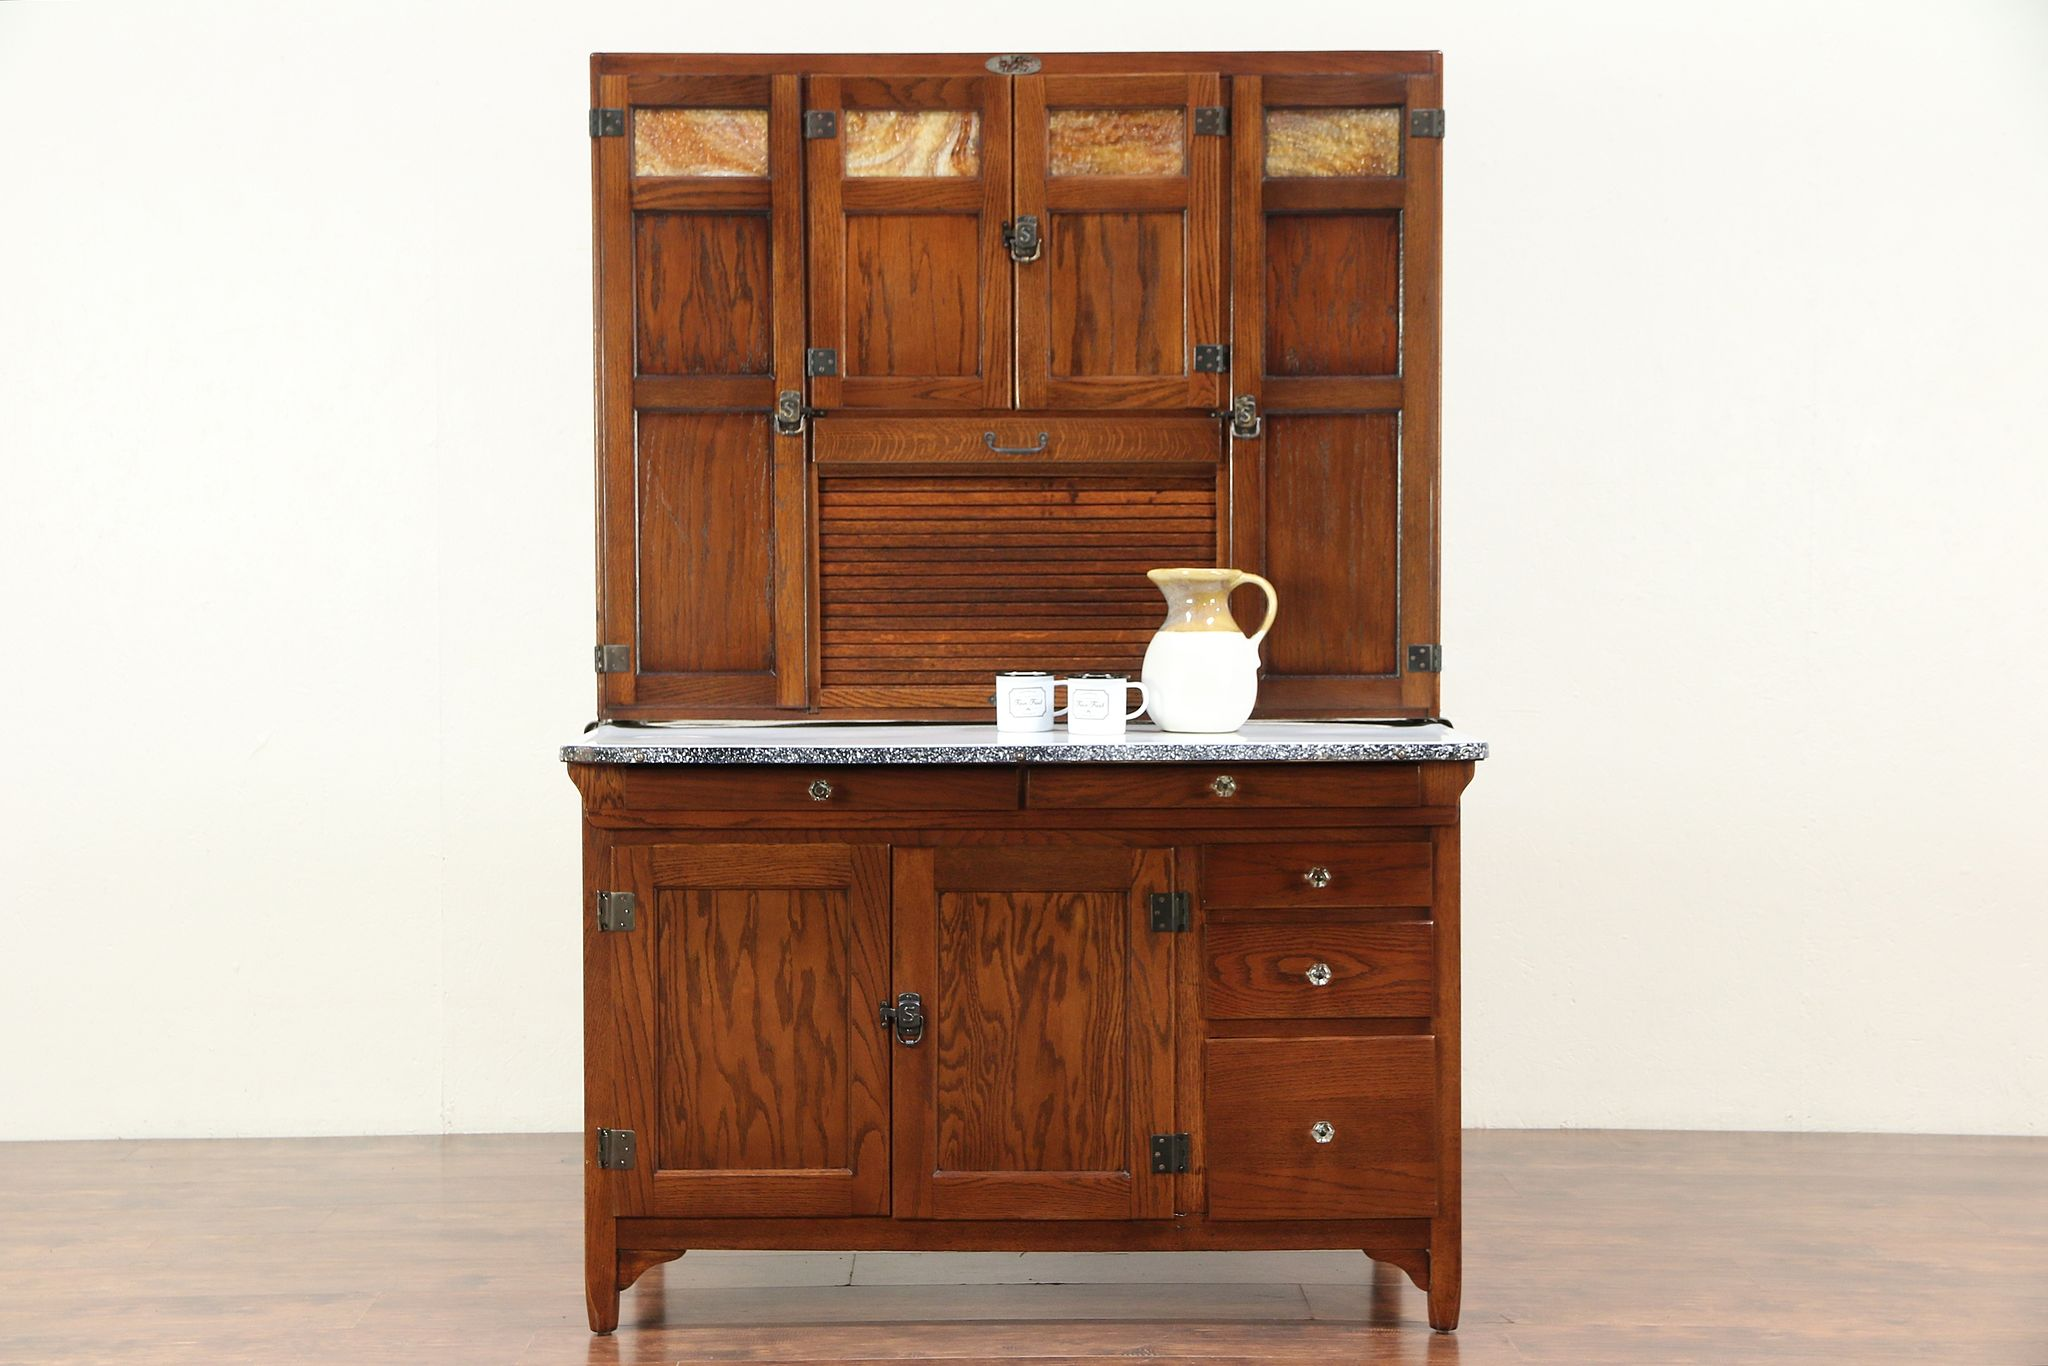 Oak Antique Hoosier Pantry Cupboard, Stained Glass, Roll Top, Sellers IN  #29461